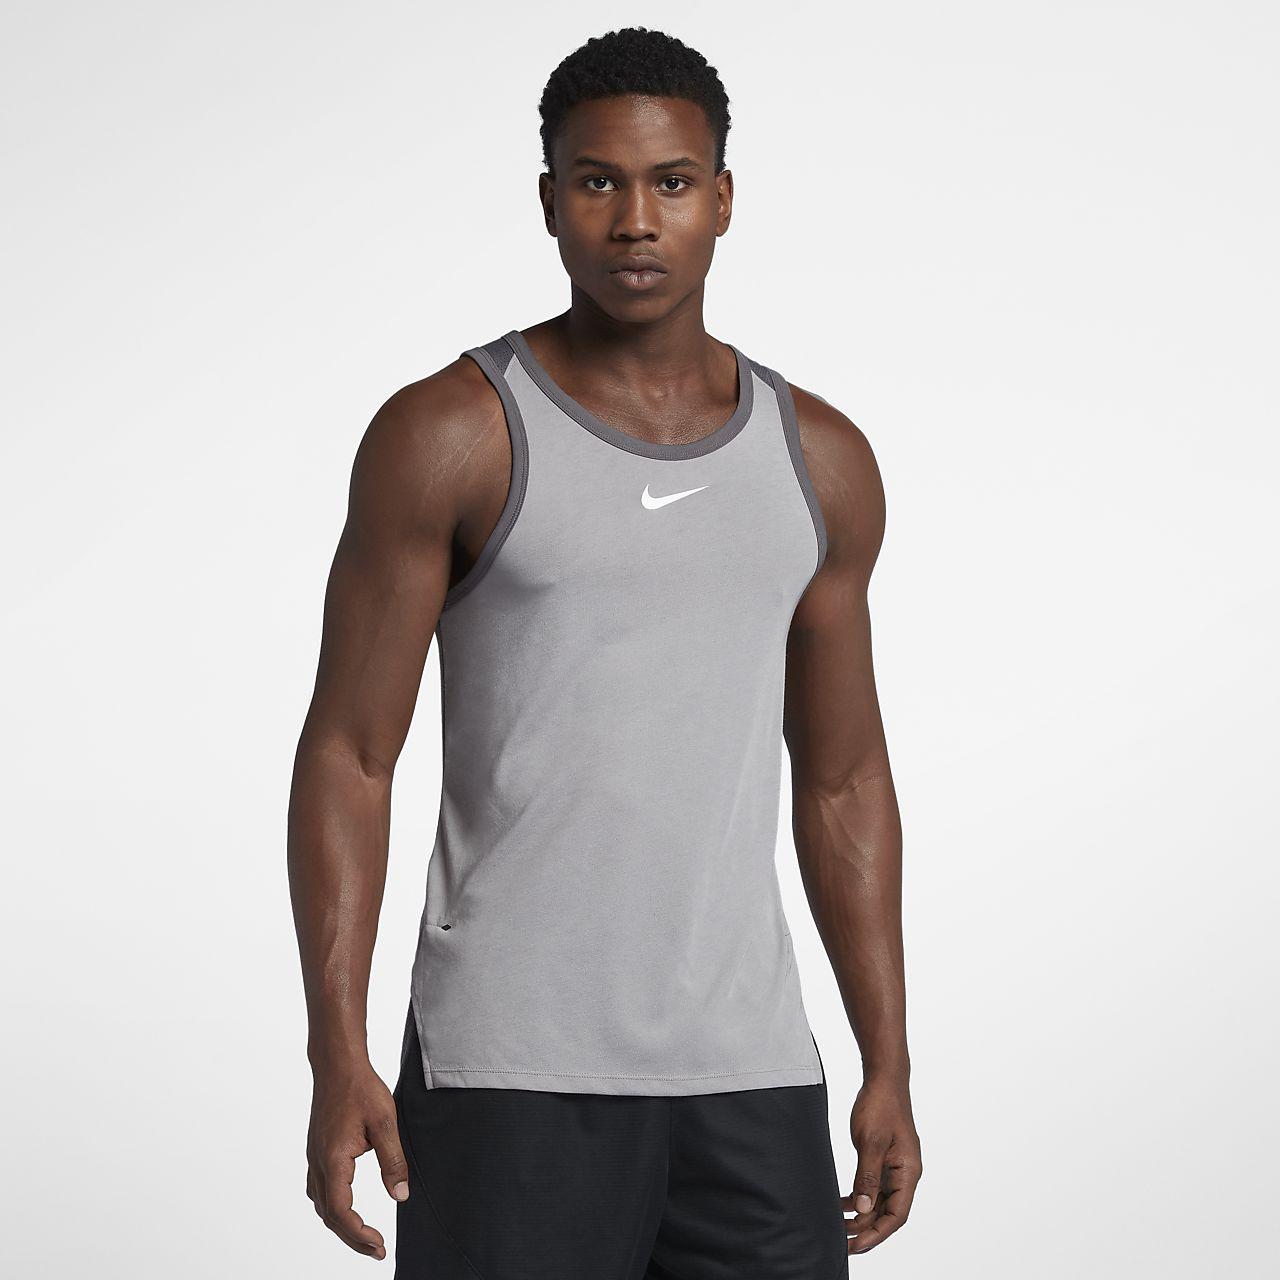 8980bb249ad44 Nike Breathe Elite Men s Sleeveless Basketball Top. Nike.com AU